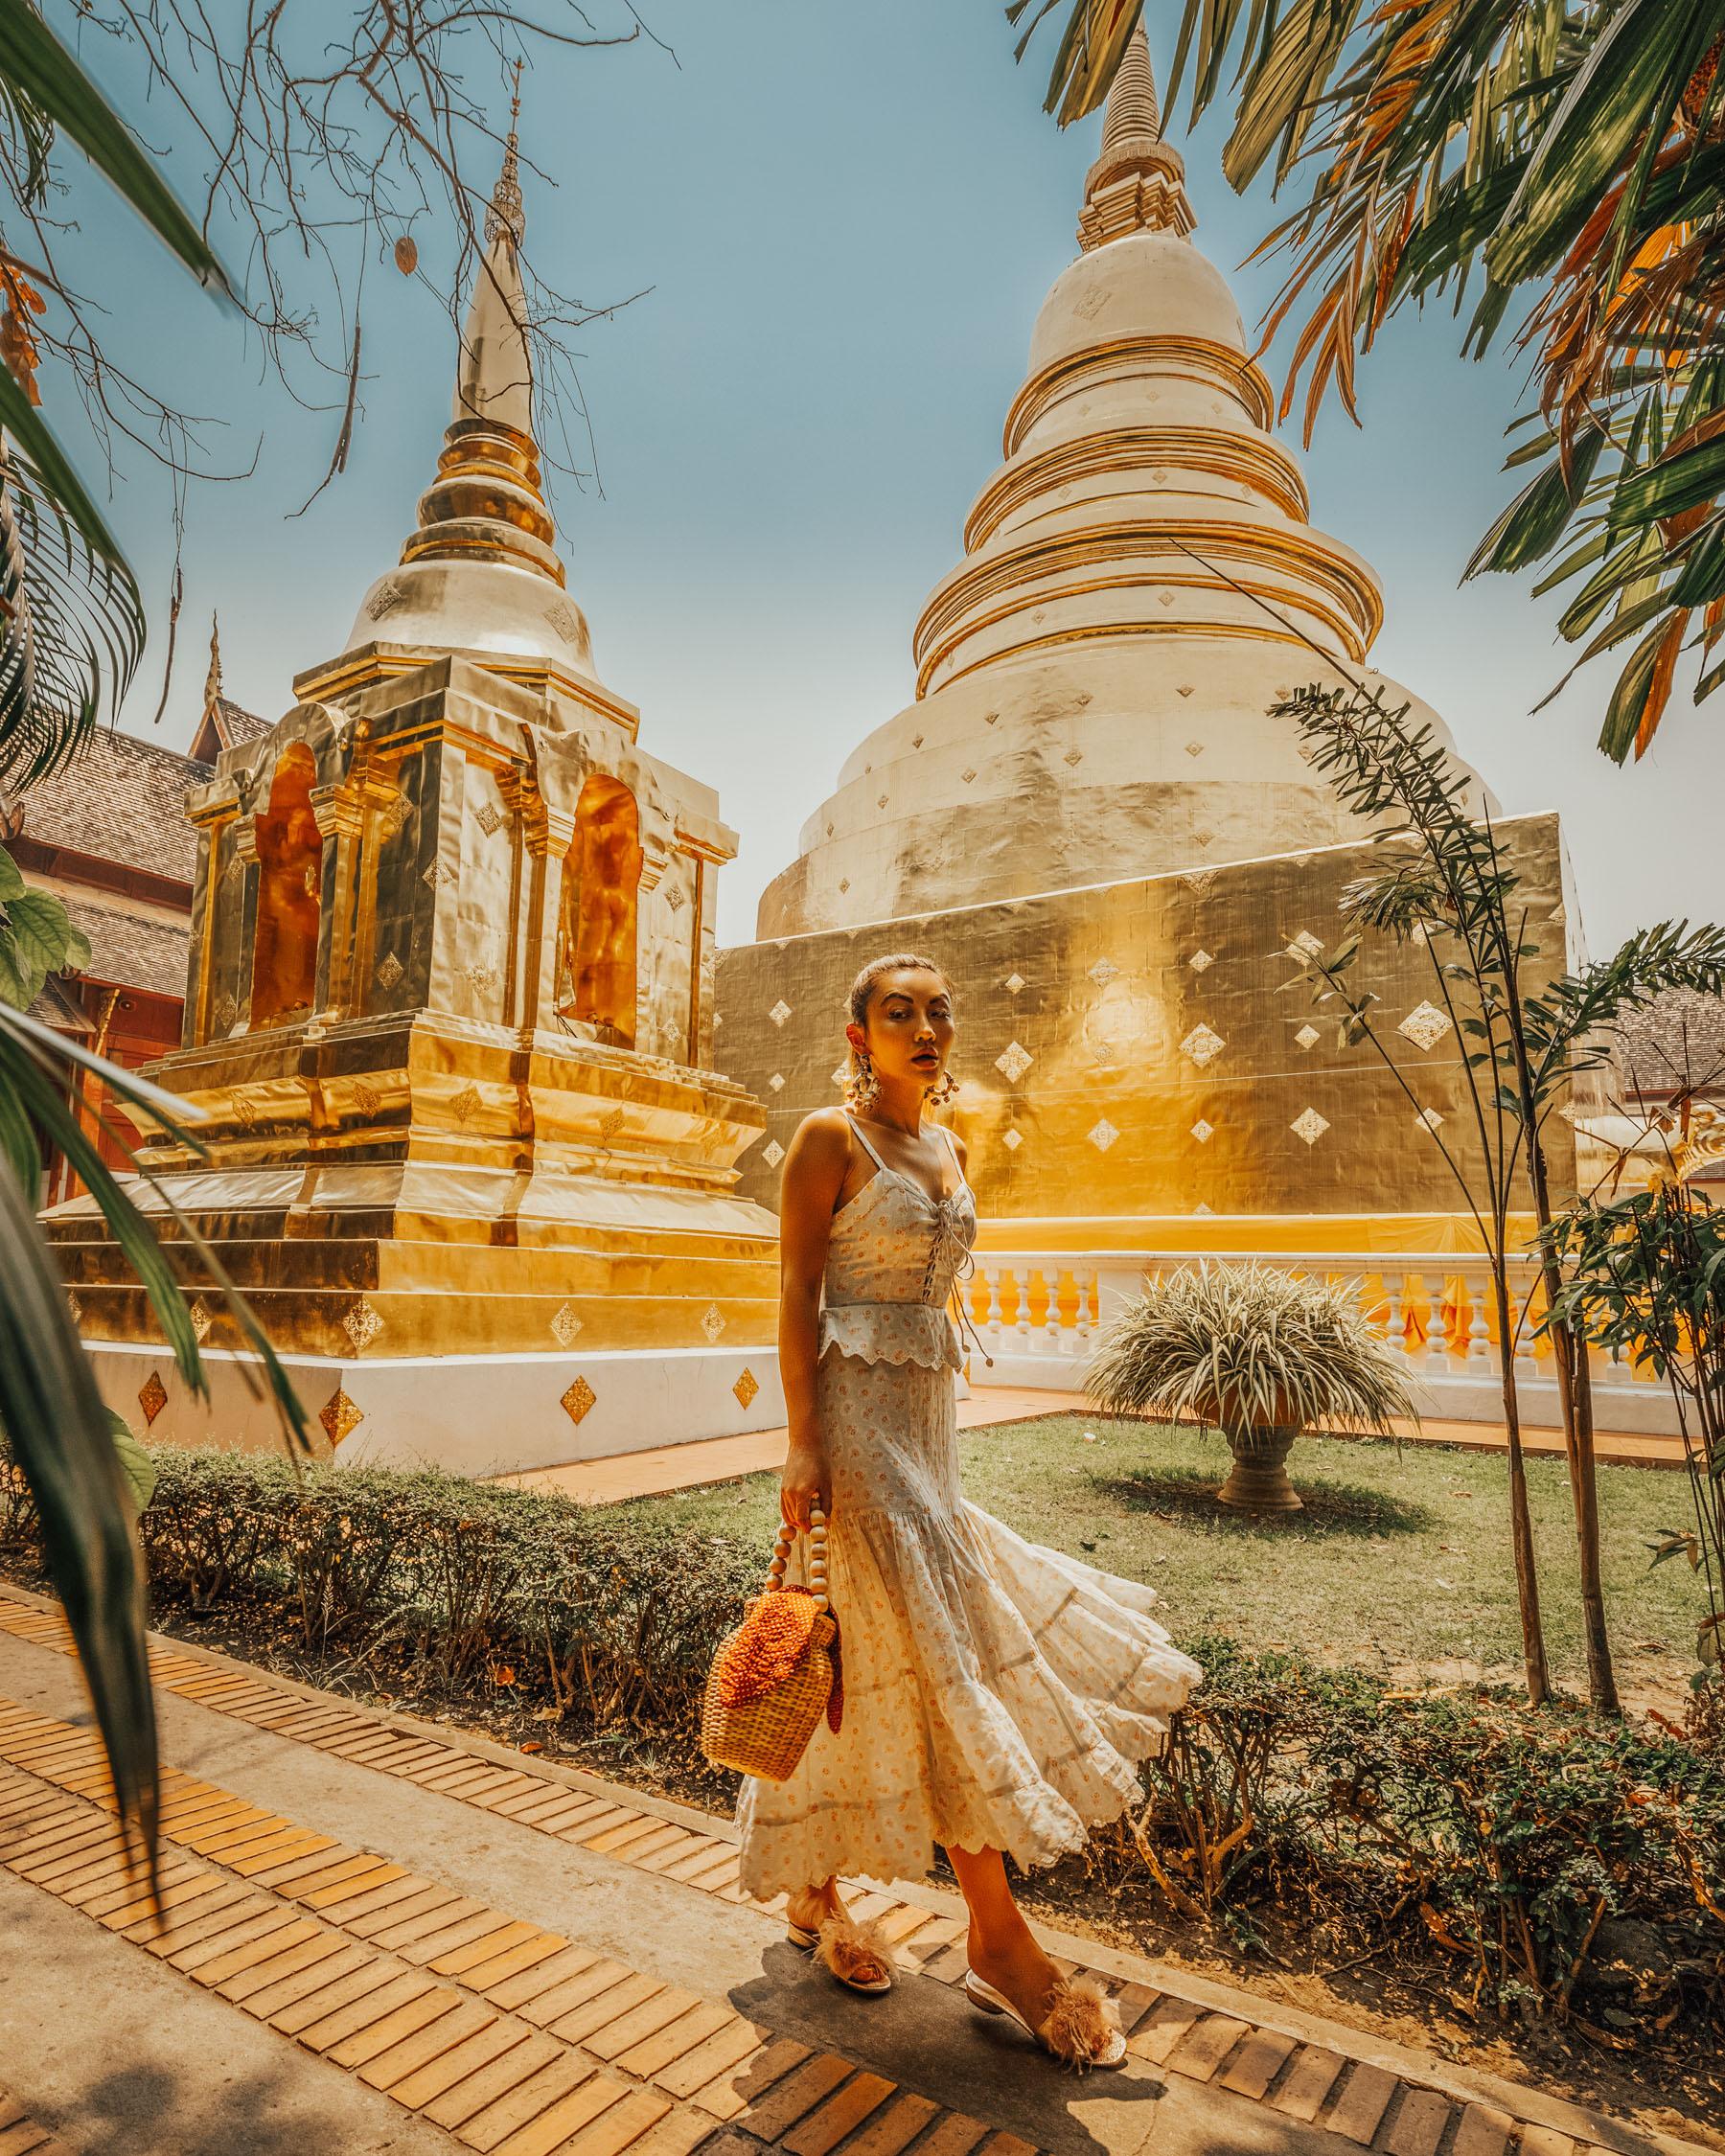 summer vacation essentials, linen dress, chiang mai thailand // Notjessfashion.com